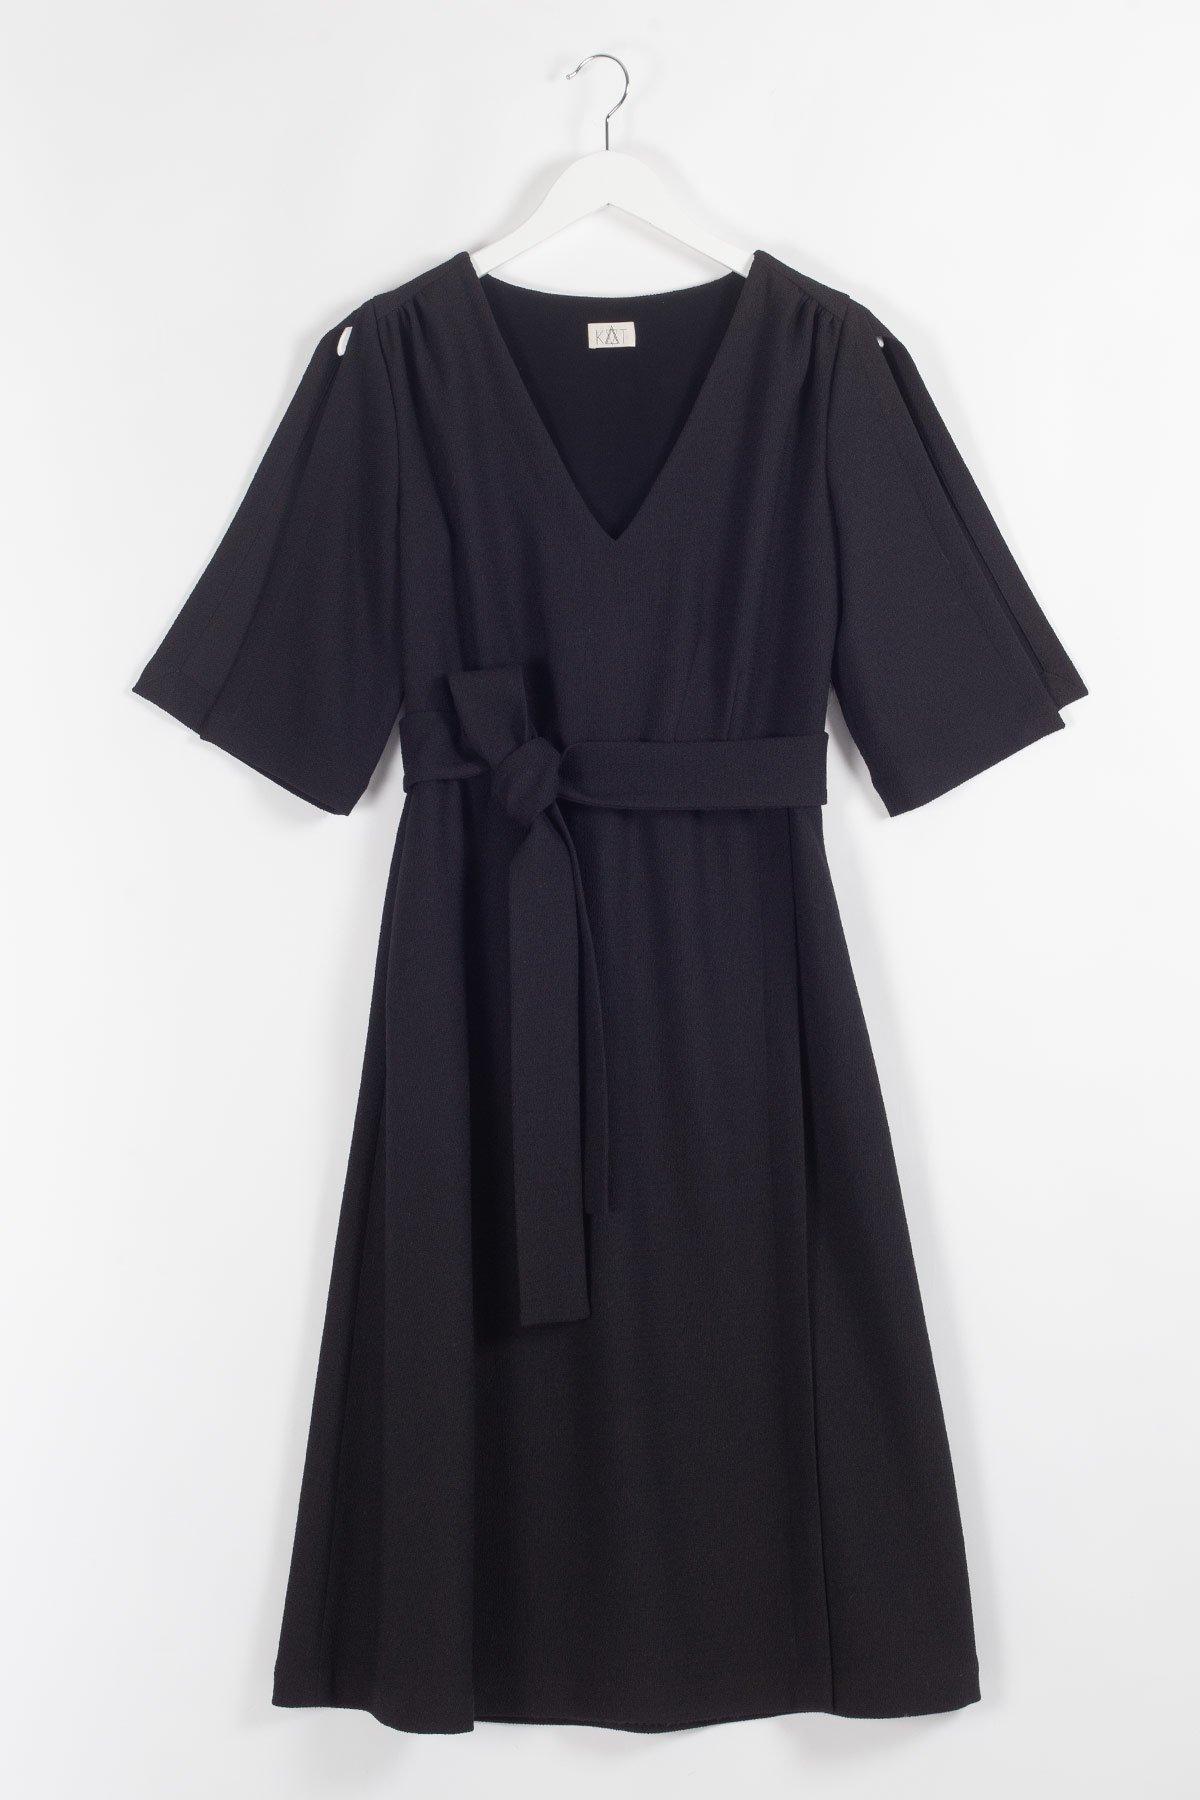 AGNESA villane kleit 314€